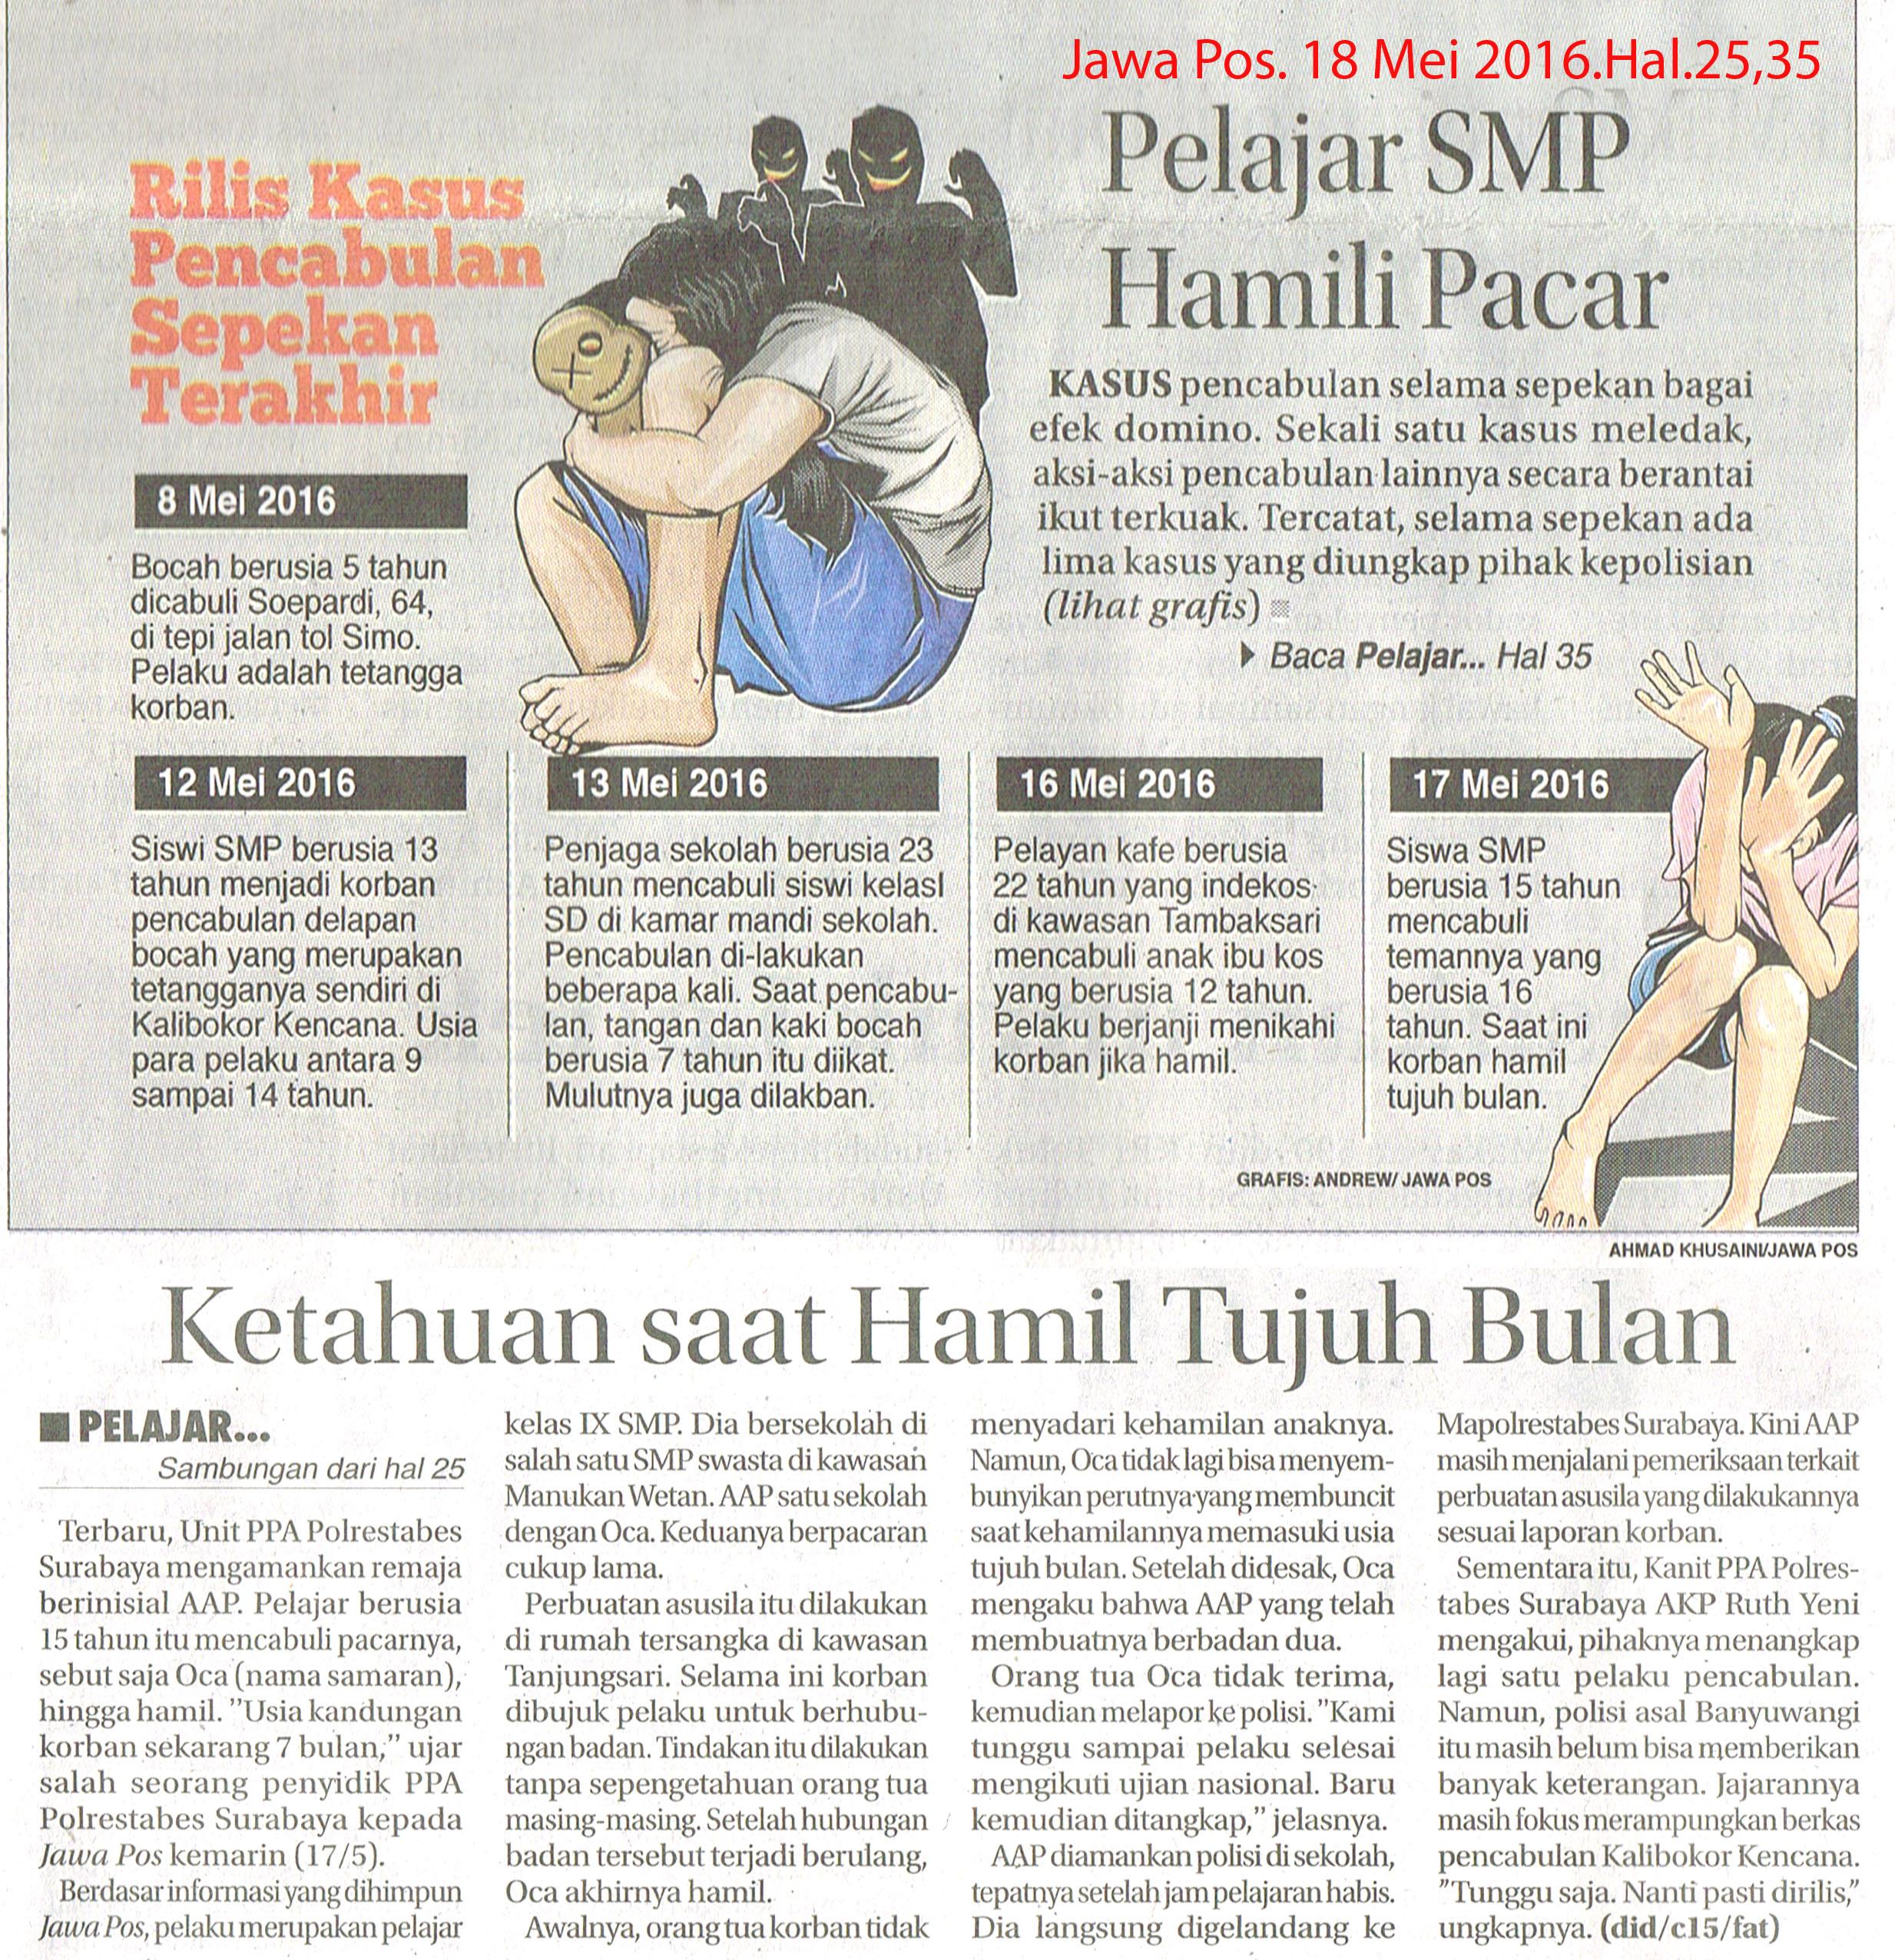 Pelajar SMP Hamili Pacar. Jawa Pos.18 Mei 2016. Hal.25,35